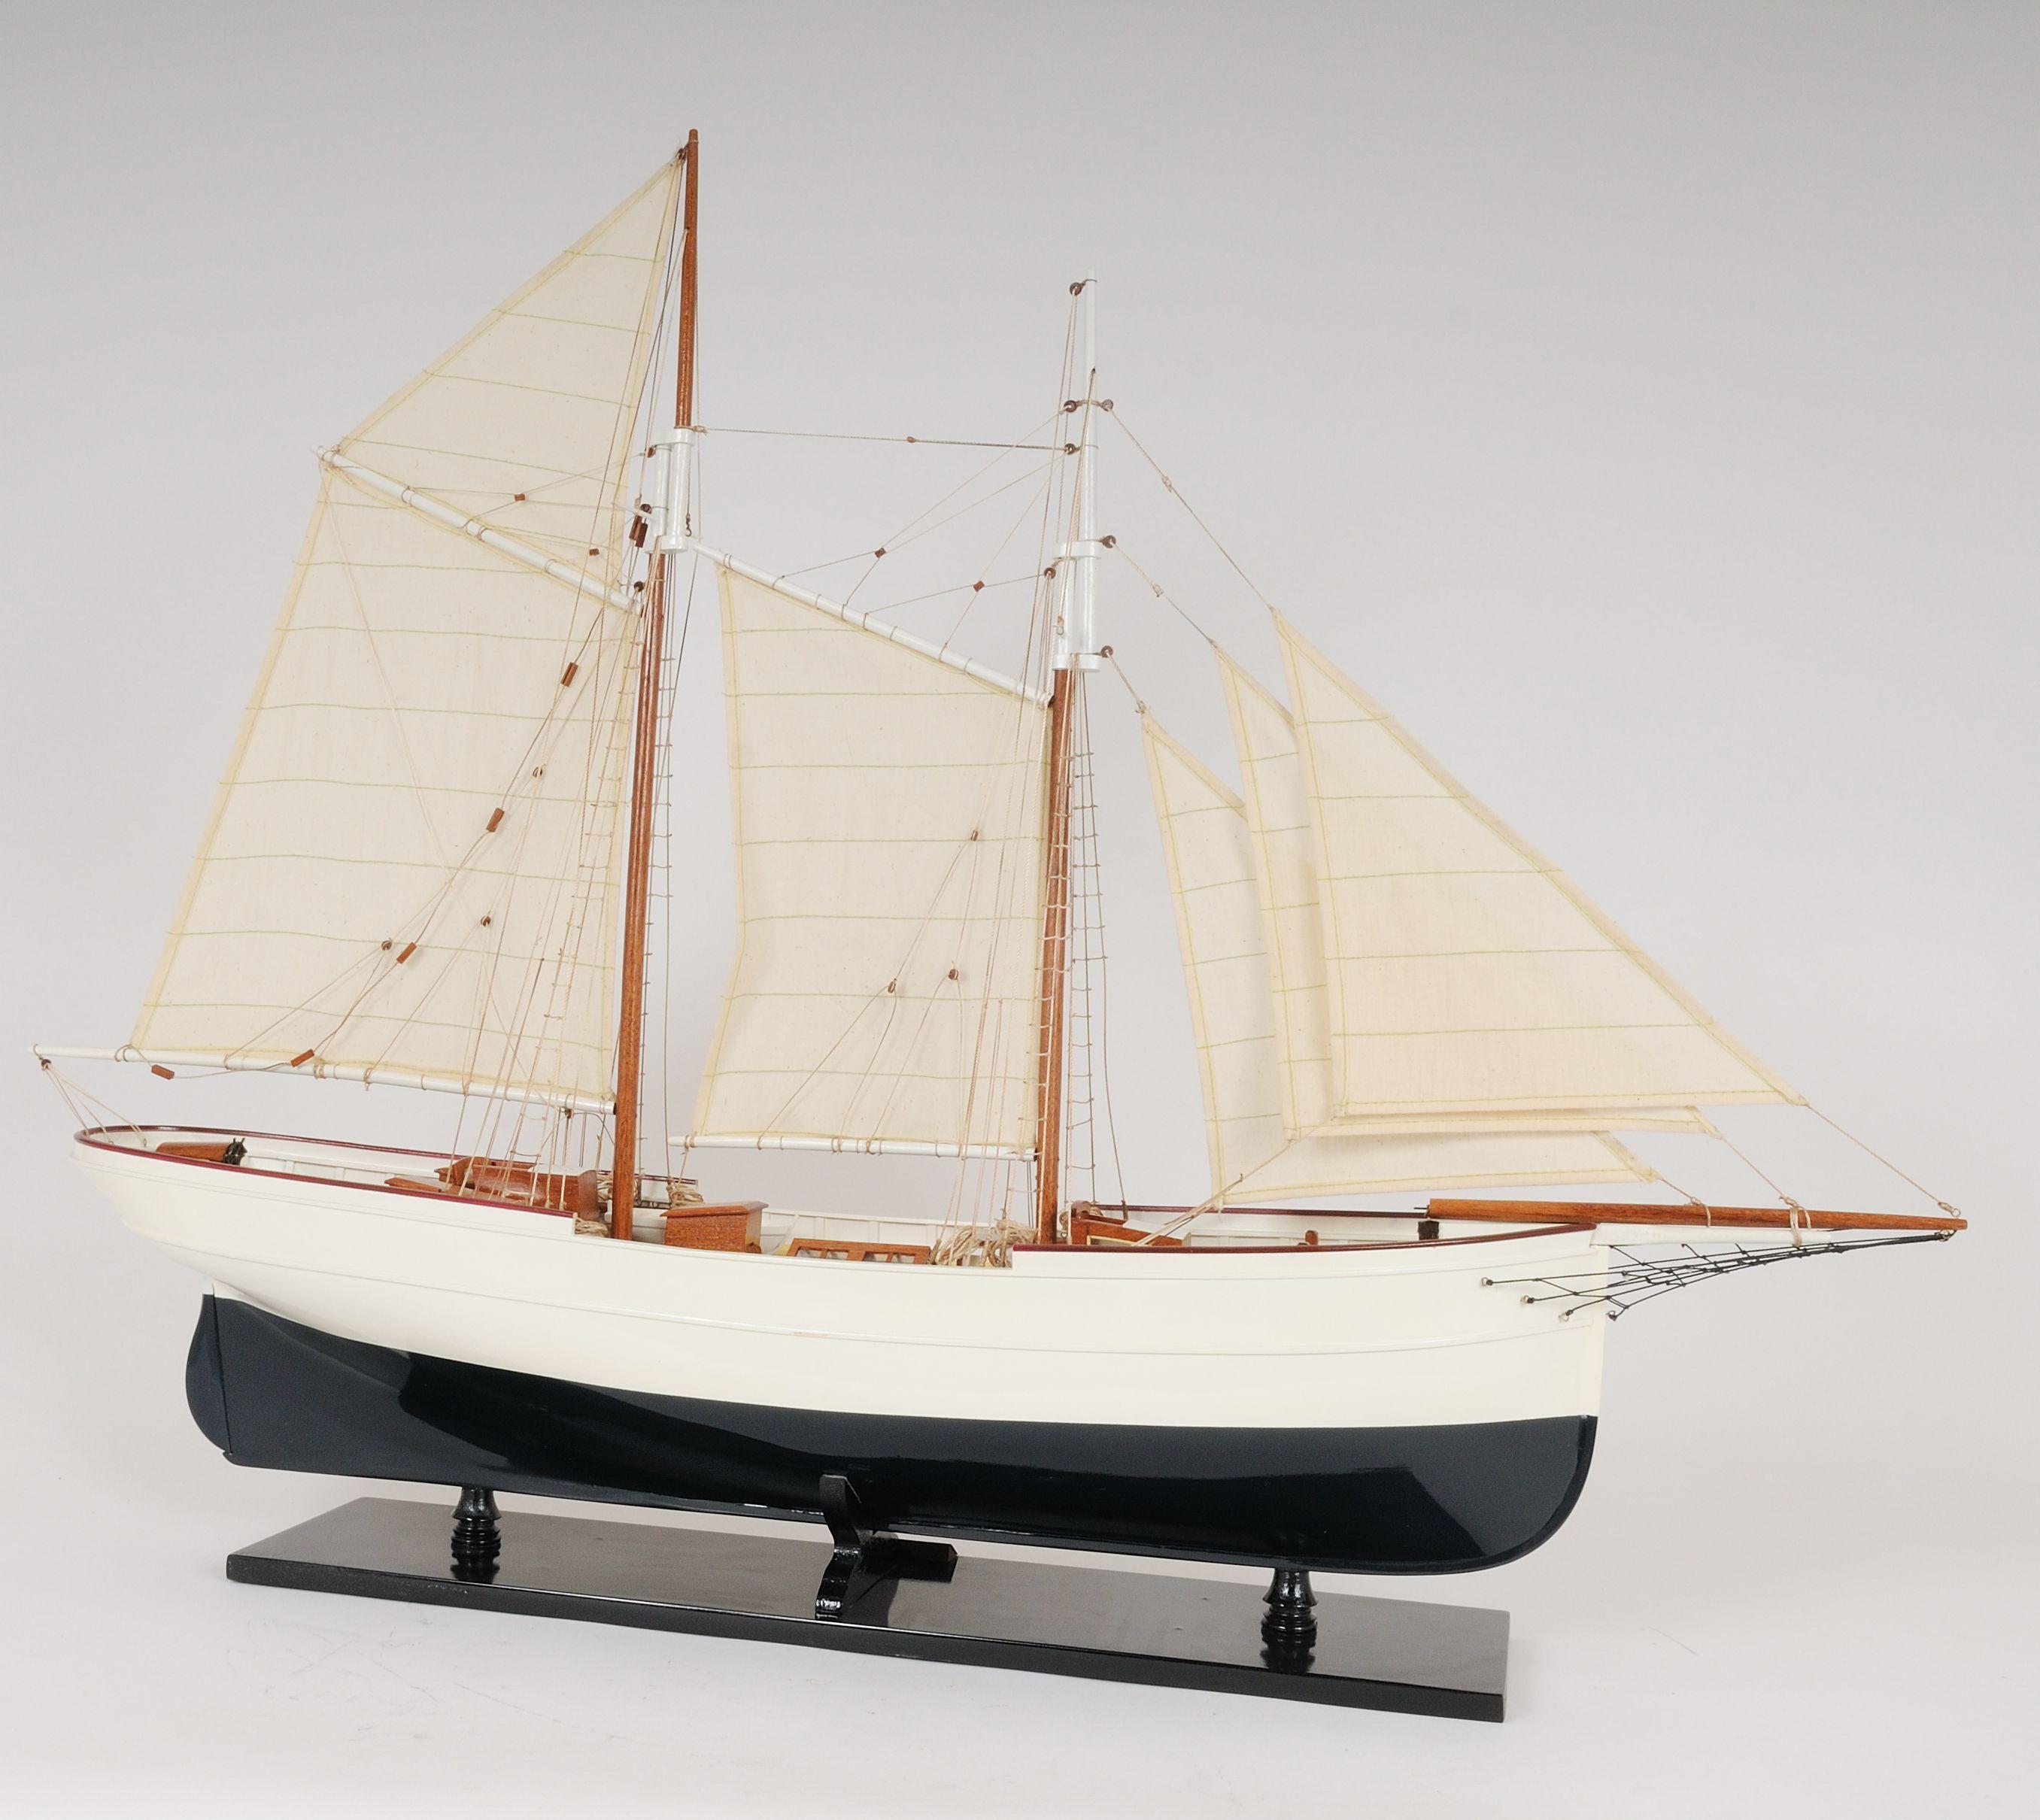 2245-13203-Wanderbird-Wooden-Model-Ship